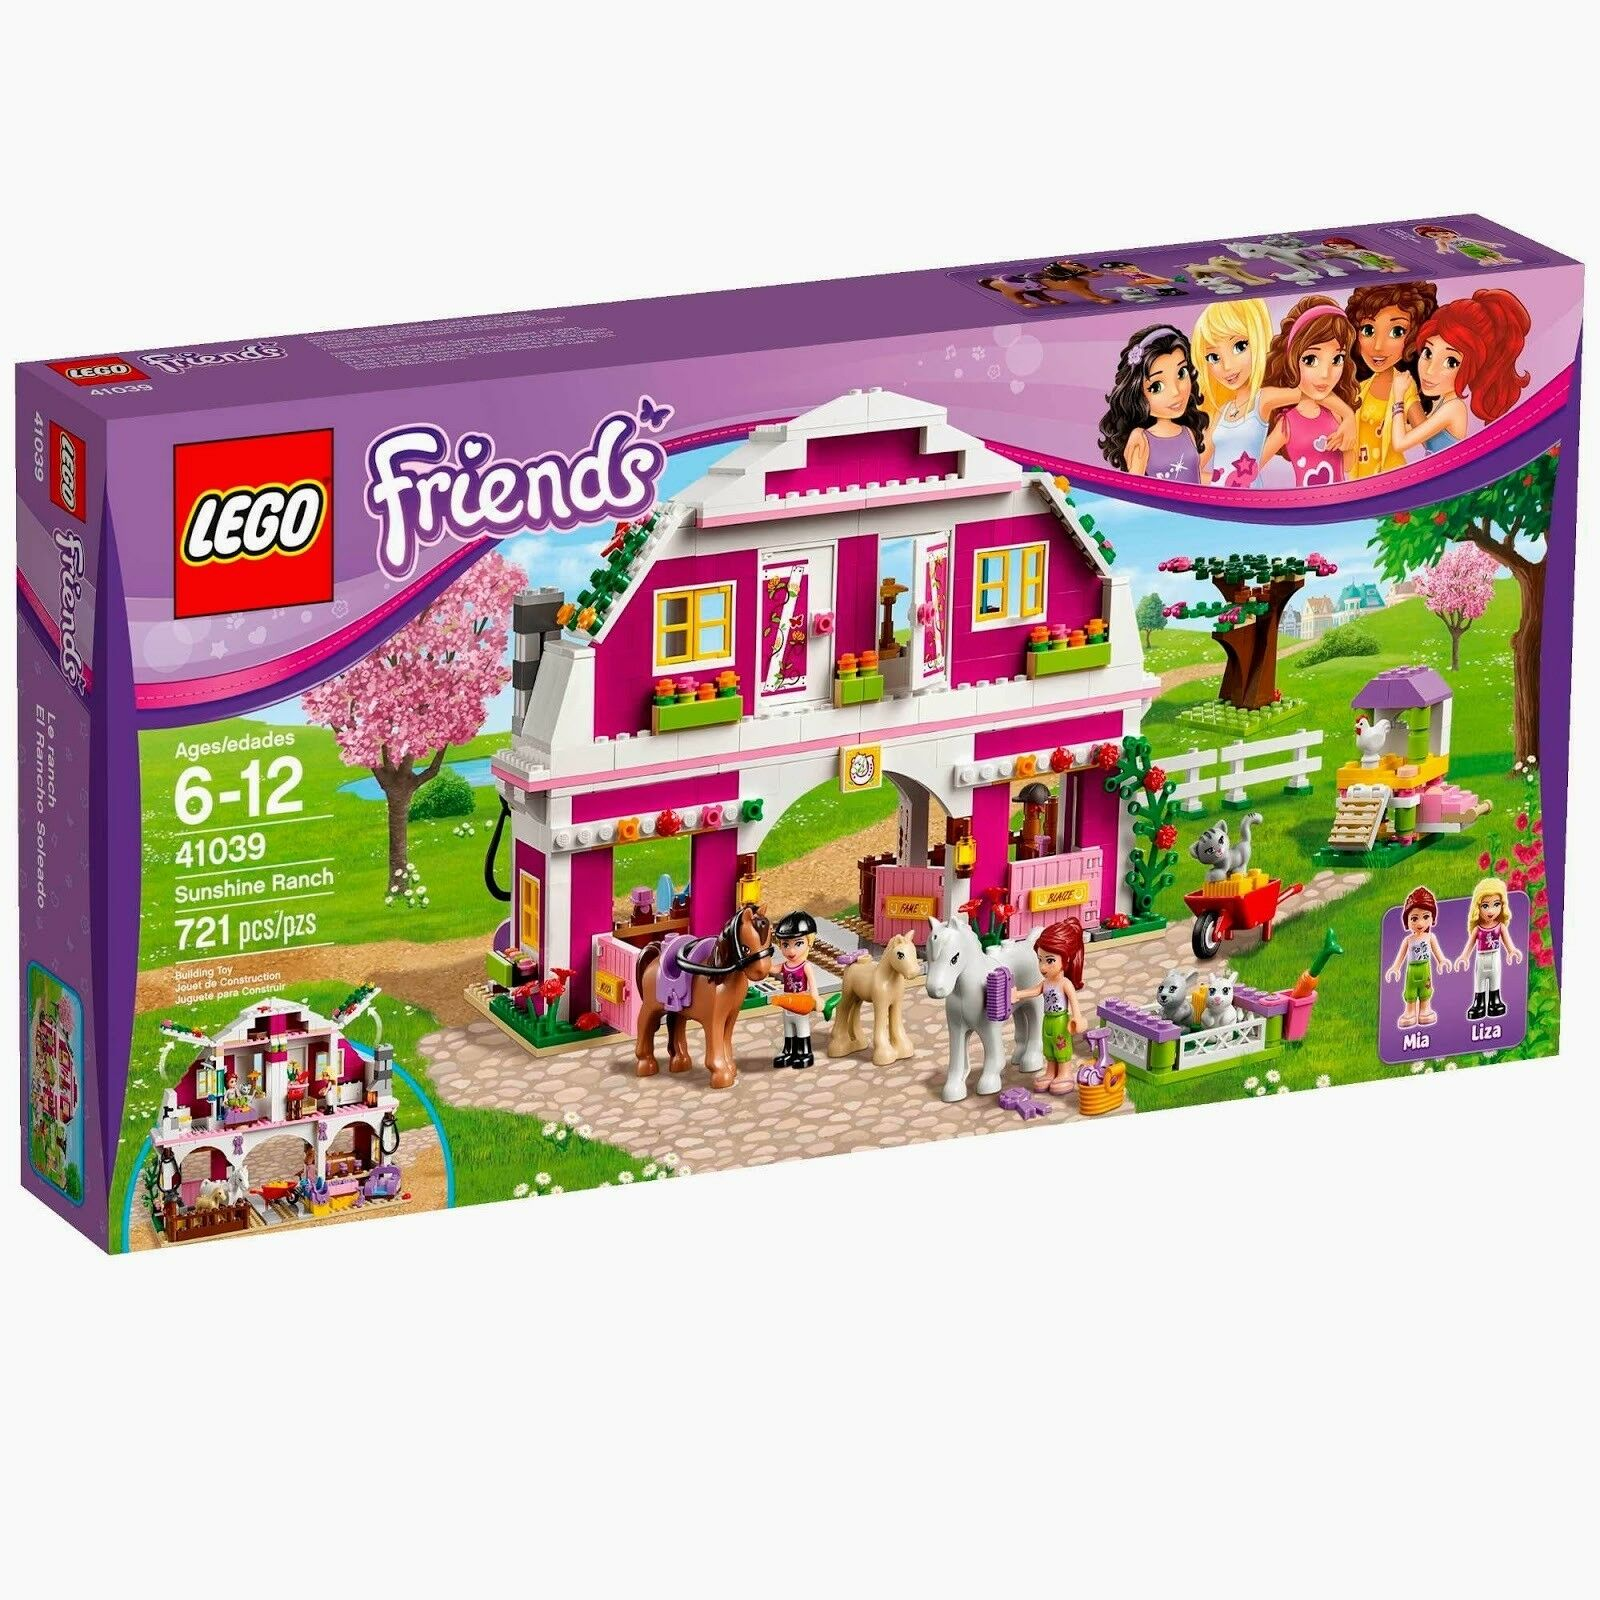 Lego Friends 41039 41039 41039 SUNSHINE RANCH Horse Saddle Pony Minifigs Xmas Present NISB 8d7f75